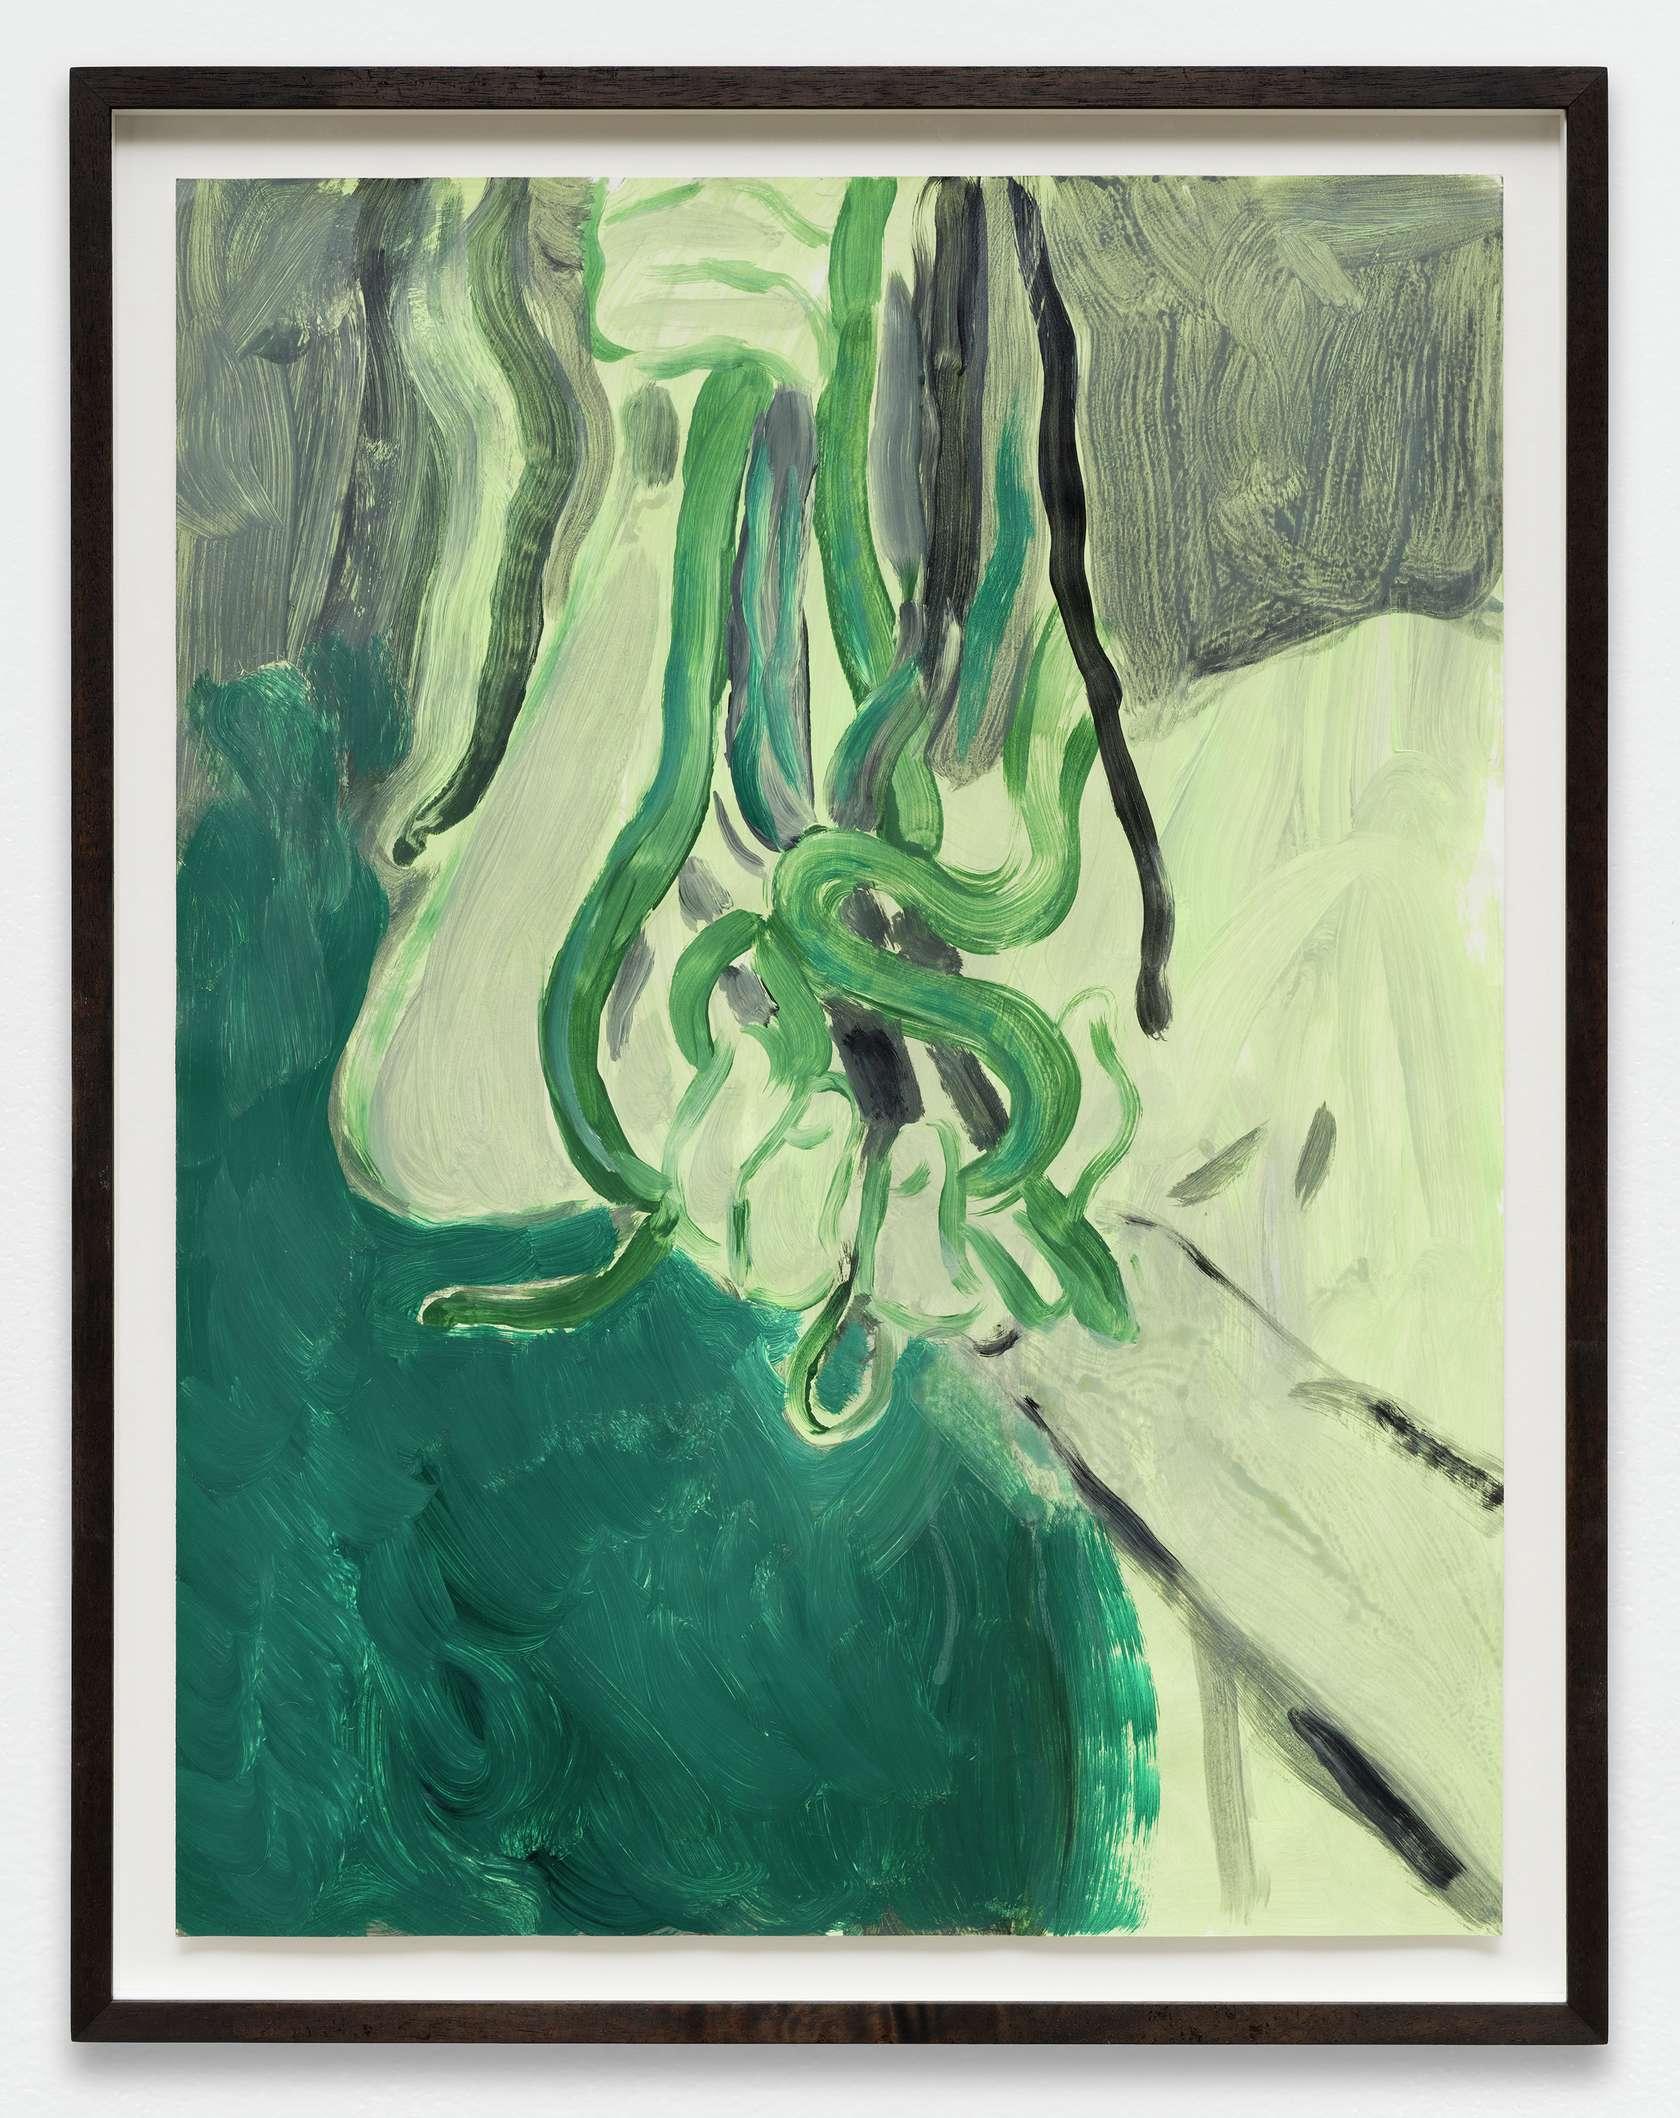 Anthony Cudahy, Snake bundle, 2019 Acrylique sur papier61 × 46 cm / 24  × 18 1/8 in. | 68 × 53 cm / 26 6/8 × 20 7/8 in. (encadré/framed)